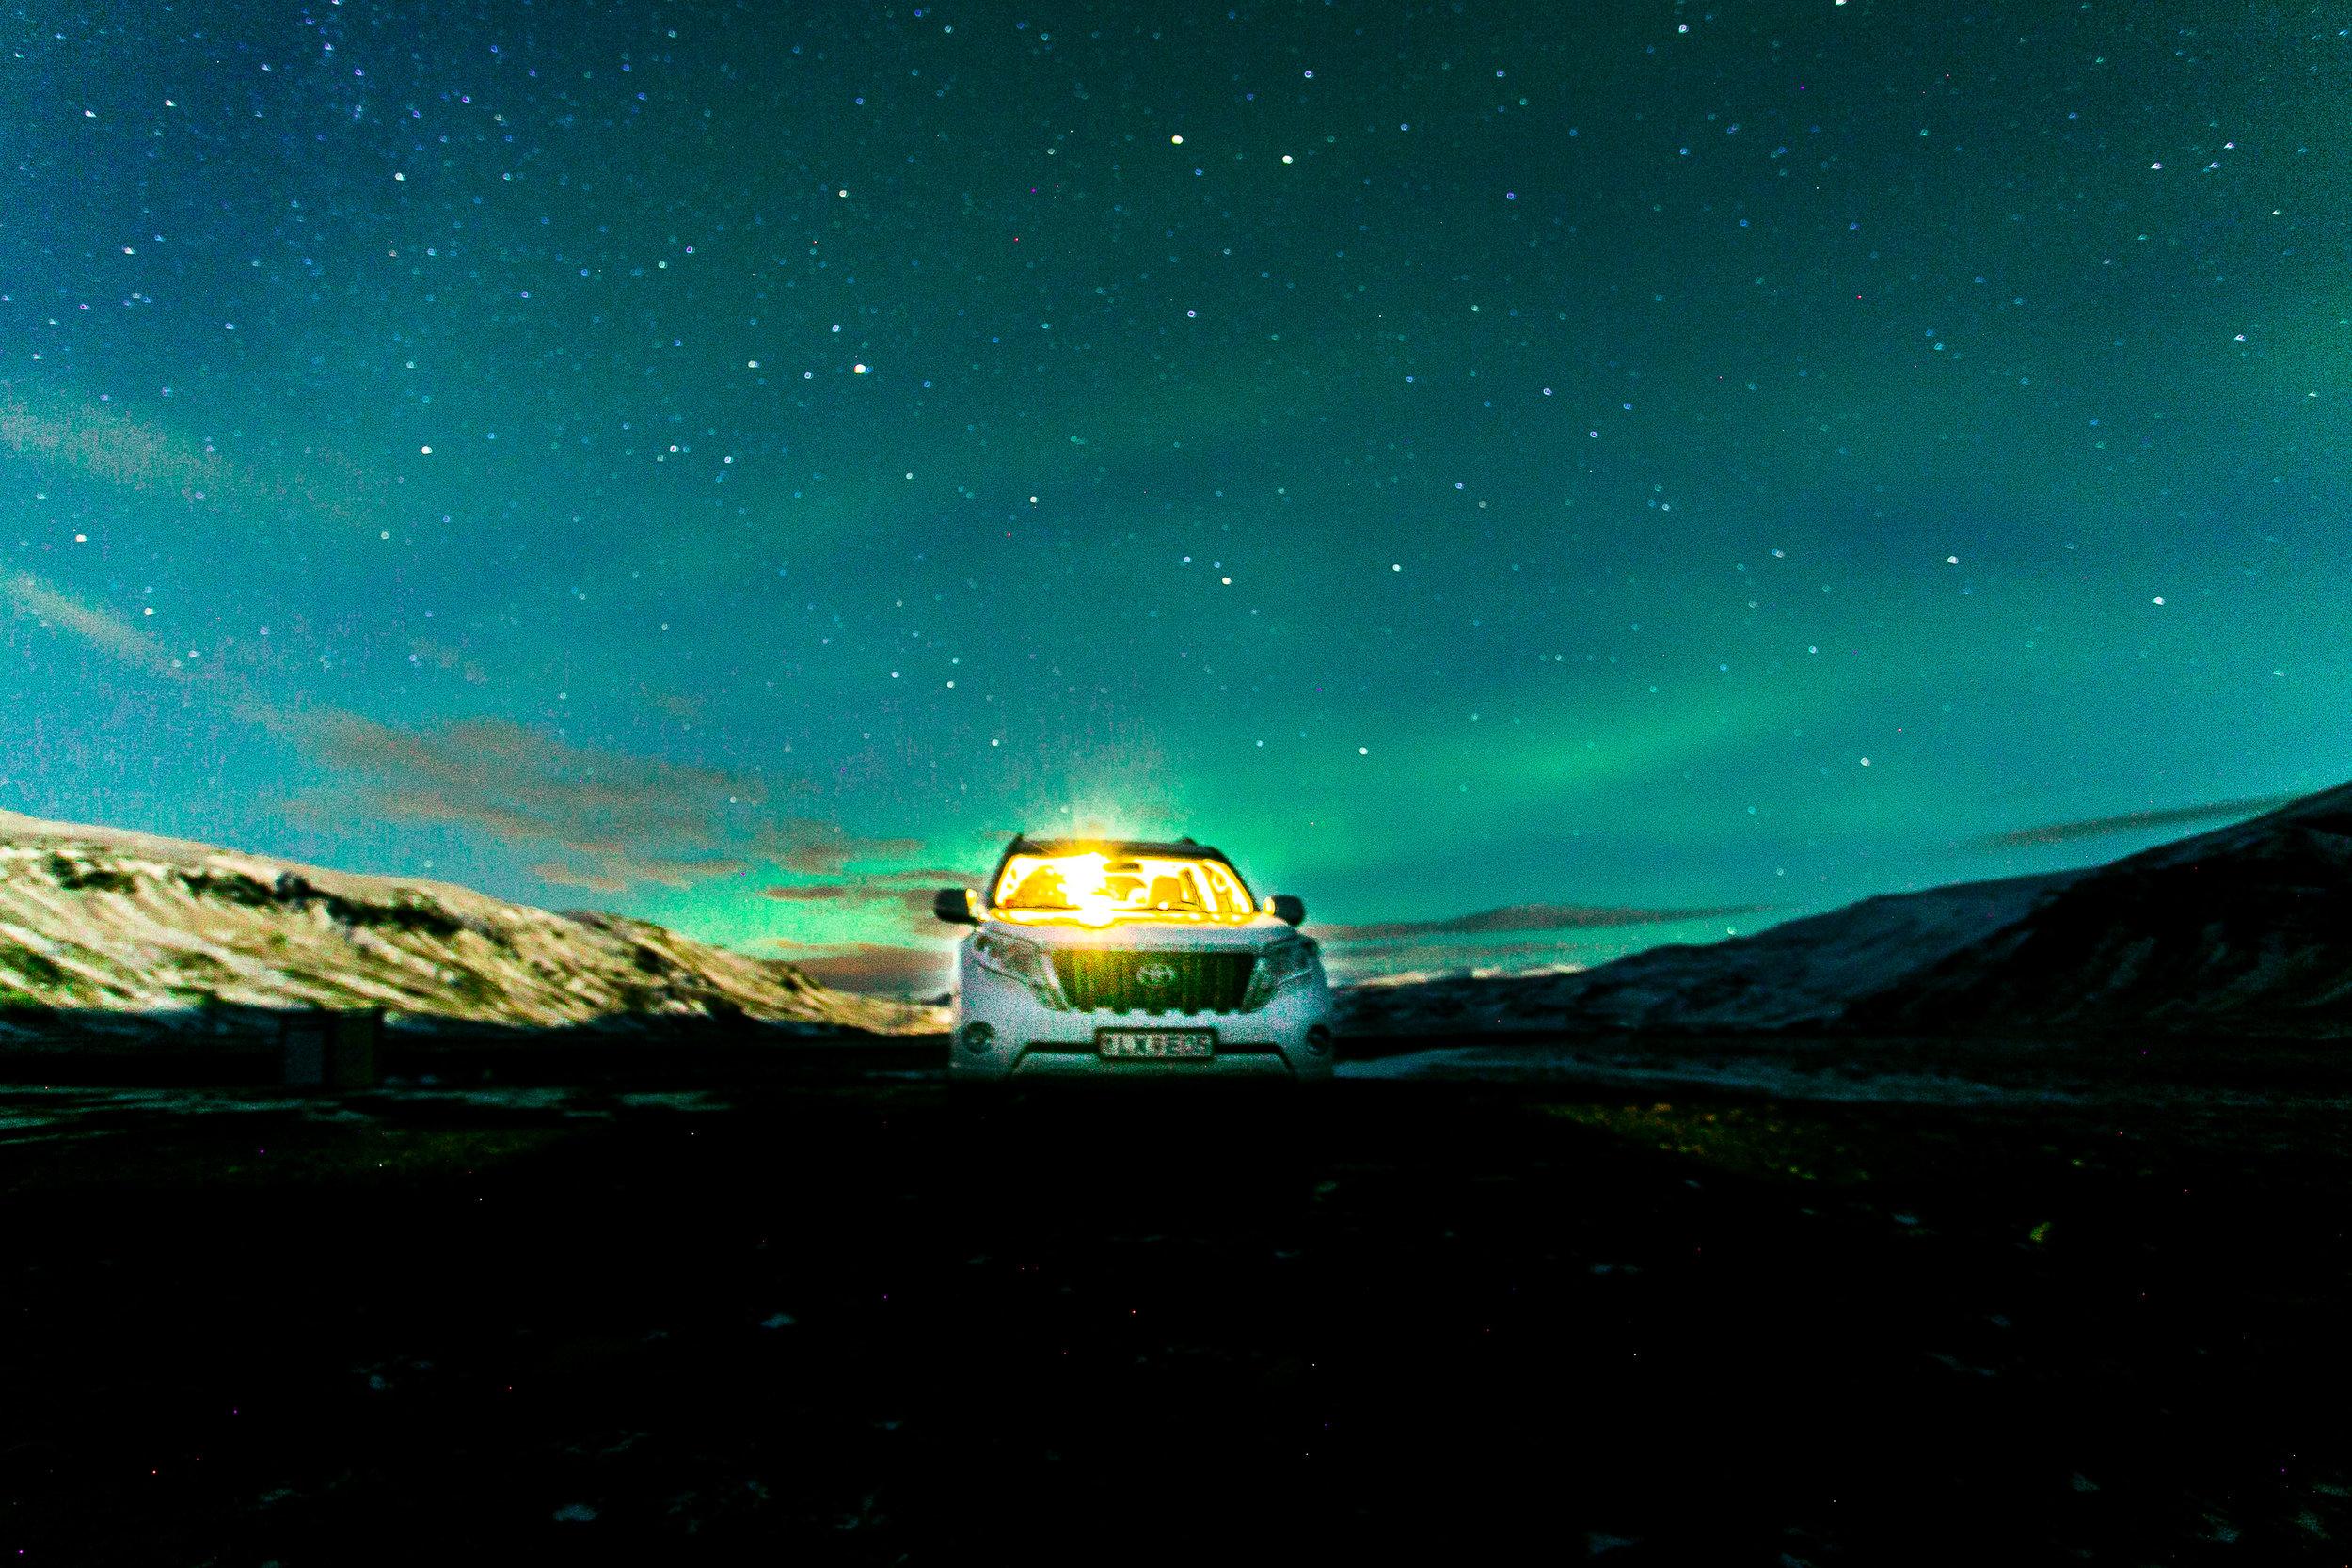 BROOKLYN FASHION PHOTOGRAPHER // ICELAND WEDDING PHOTOGRAPHER // CREATIVE PORTRAIT PHOTOGRAPHER // Iceland product photography